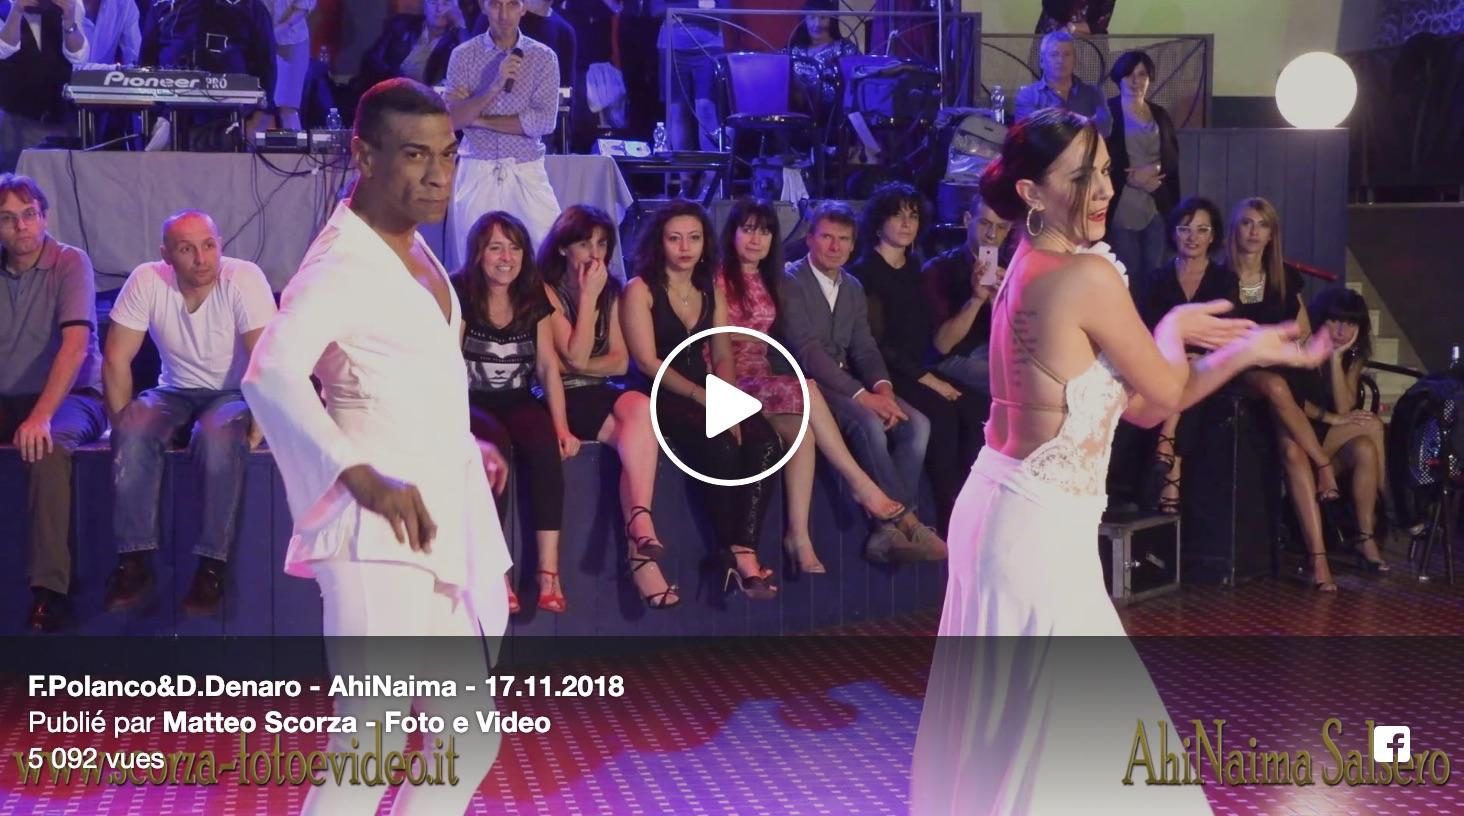 Felipe Polanco et Denise Denaro – AhiNaima en Italie – Spectacle du 17.11.2018